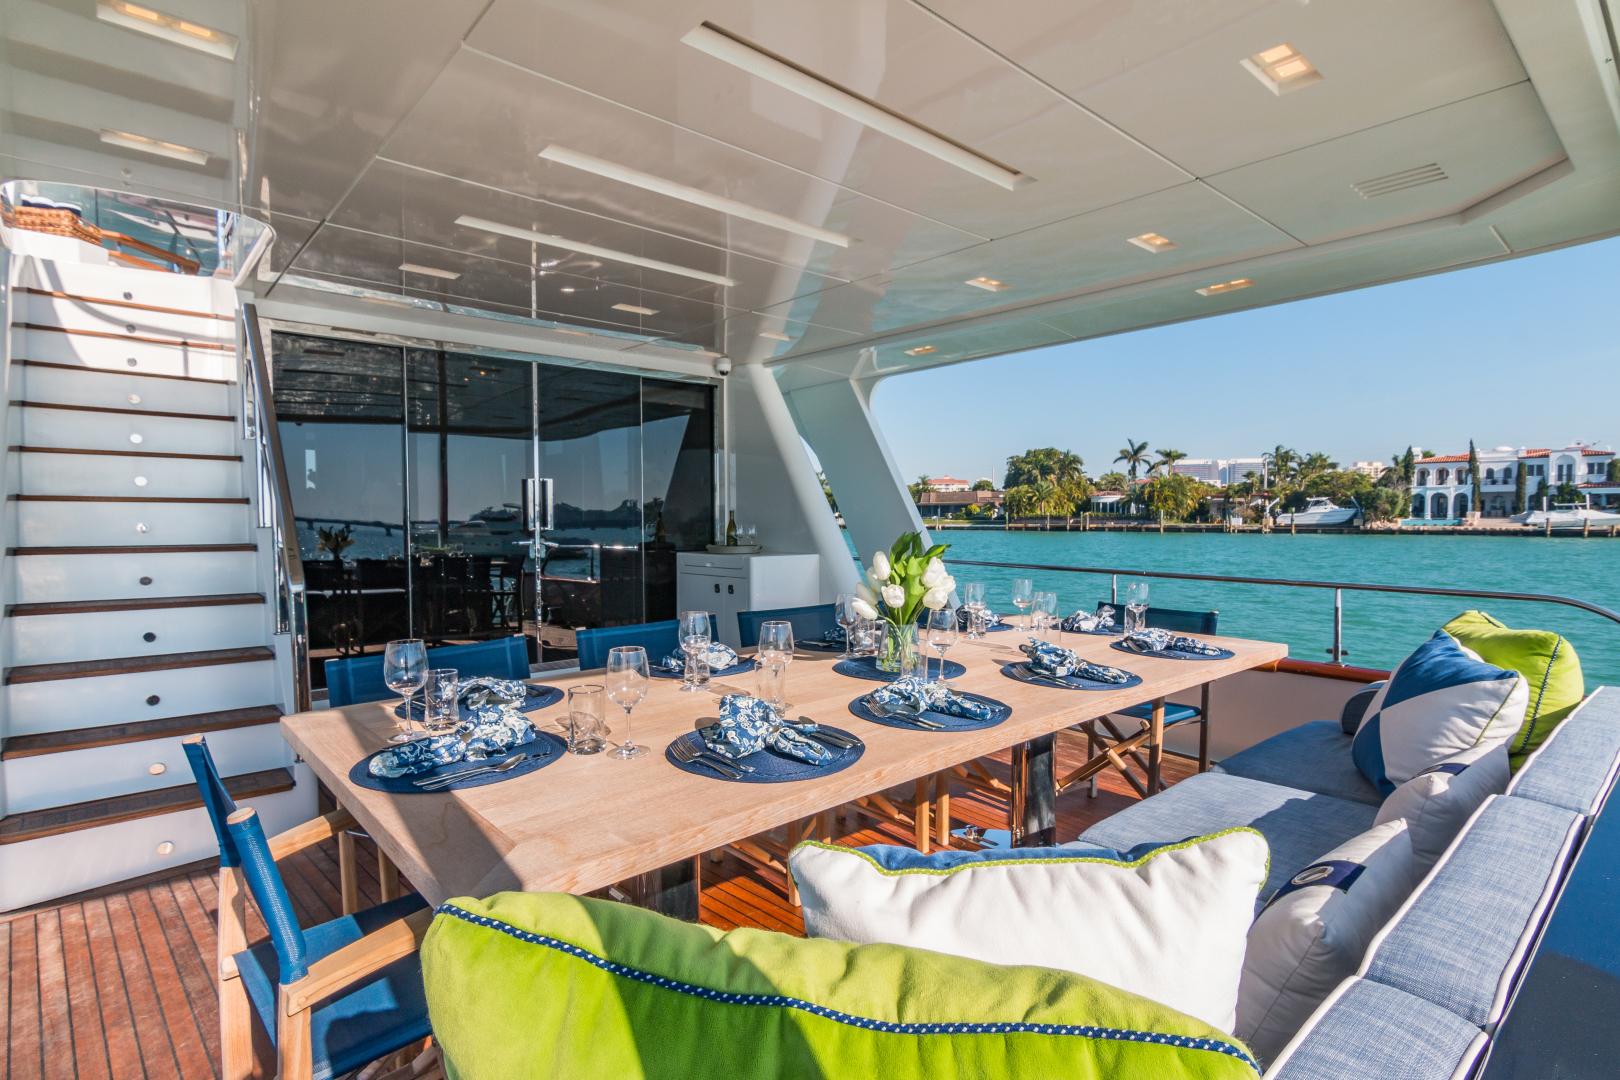 Vicem-Raised Pilot House 2013-MONI FORT LAUDERDALE-Florida-United States-AFT DECK DINING -1394883 | Thumbnail